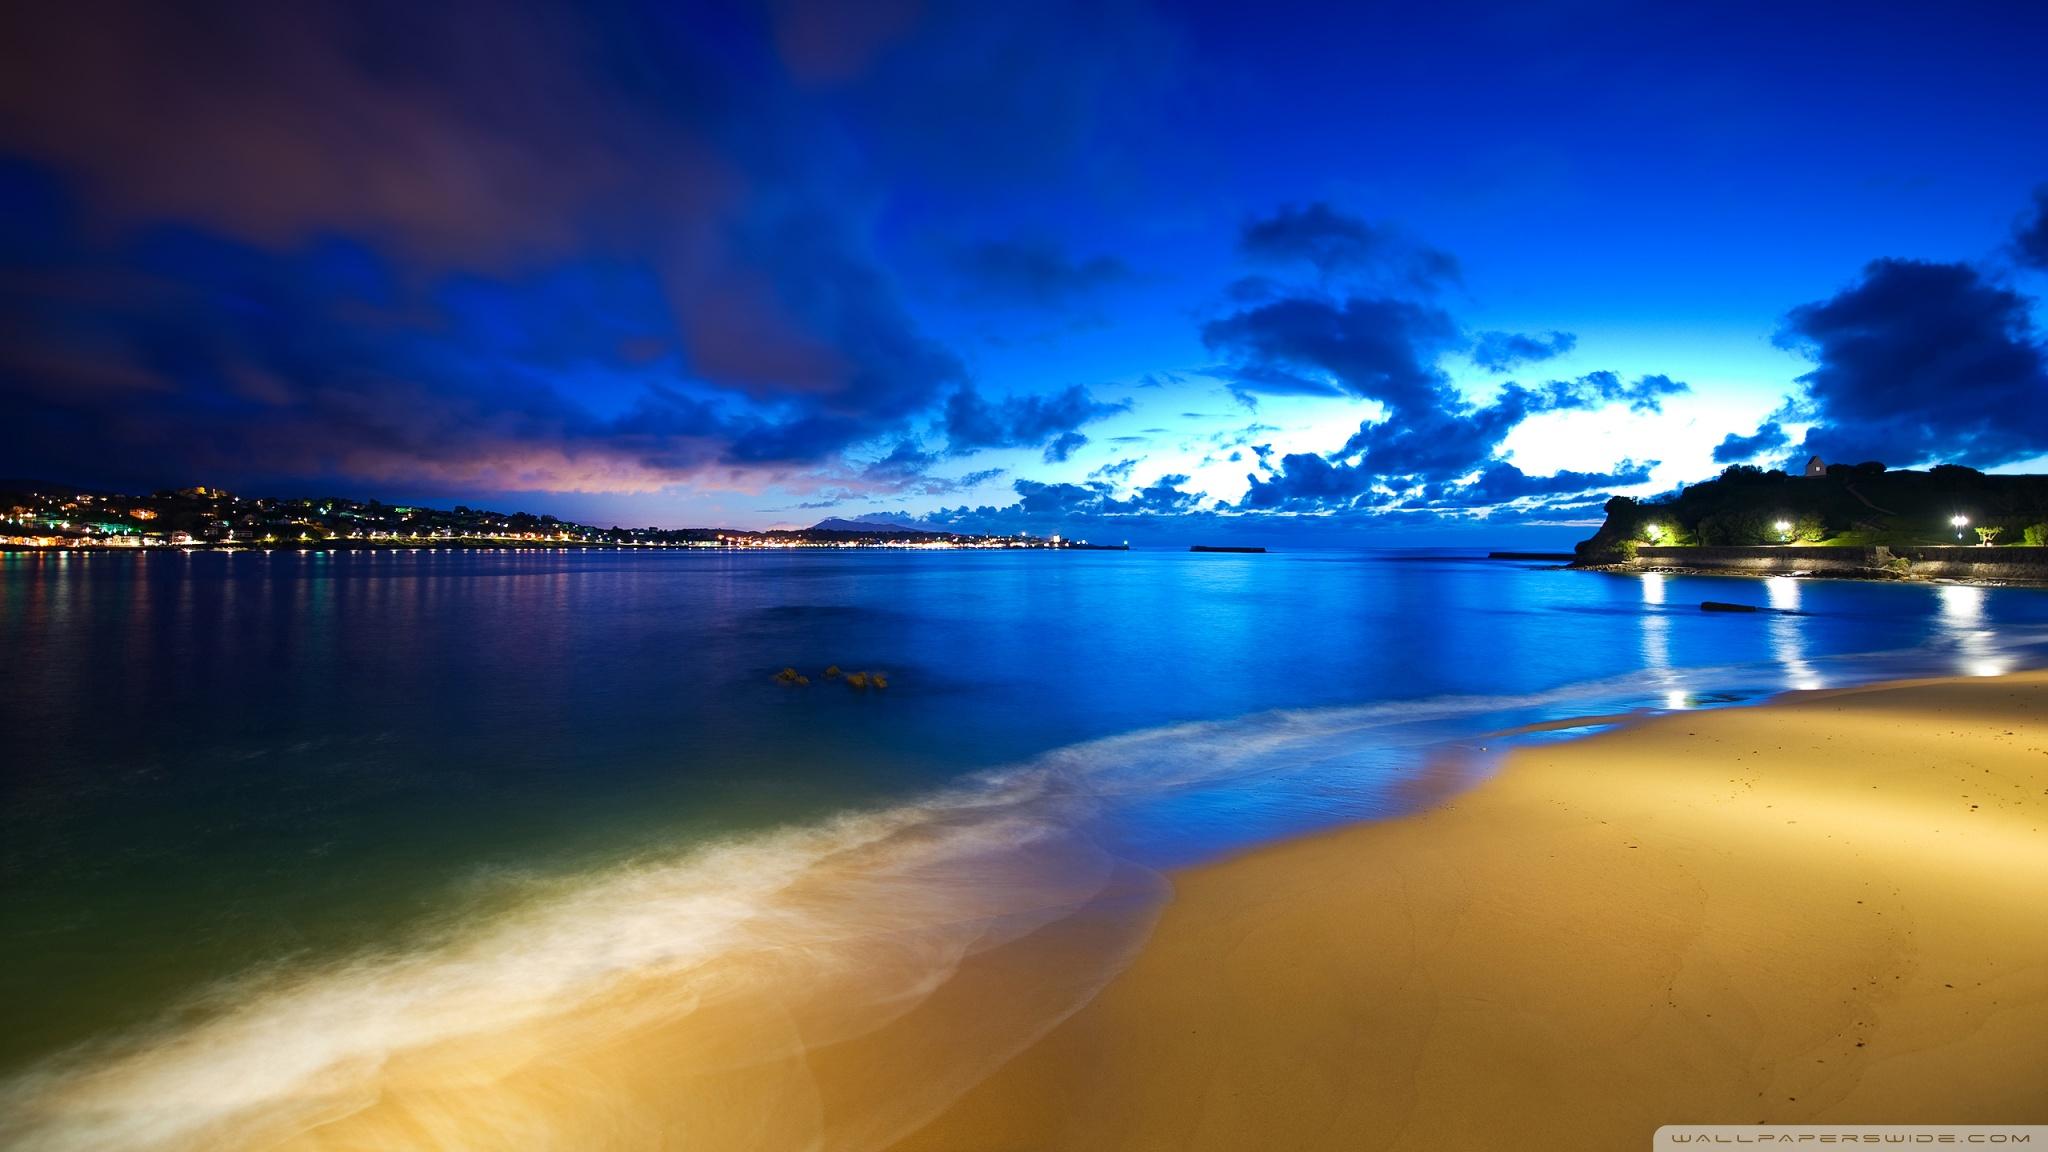 ocean ❤ 4k hd desktop wallpaper for • wide & ultra widescreen